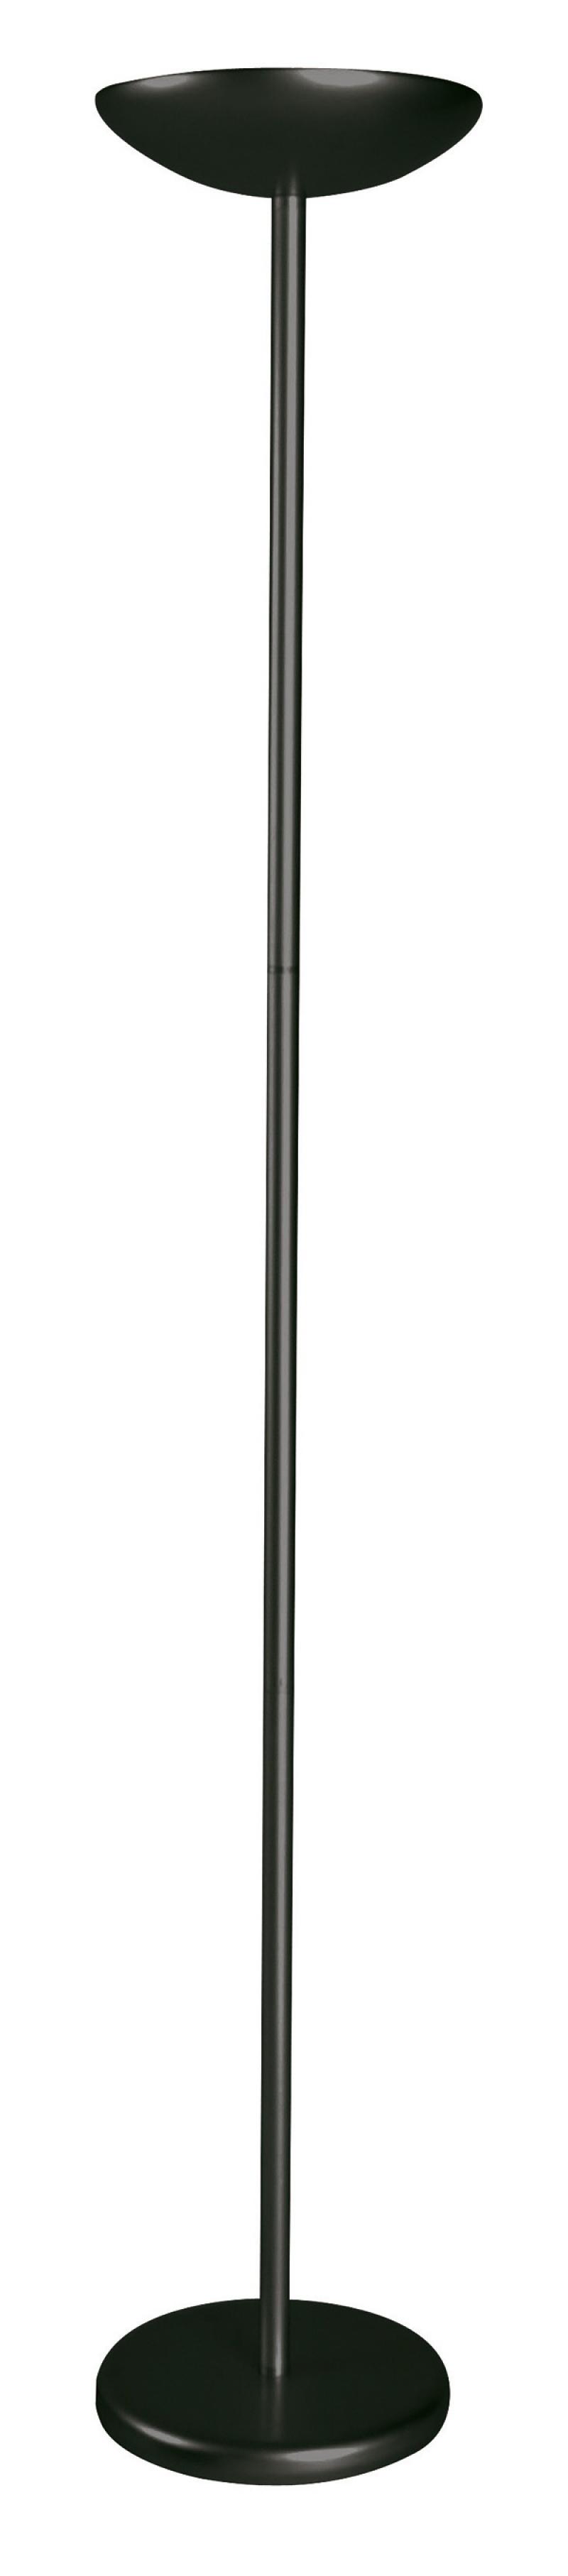 Energy efficient floor lamps flooring ideas and inspiration energy efficient floor lamp maulsky 2x20w black intur mozeypictures Choice Image